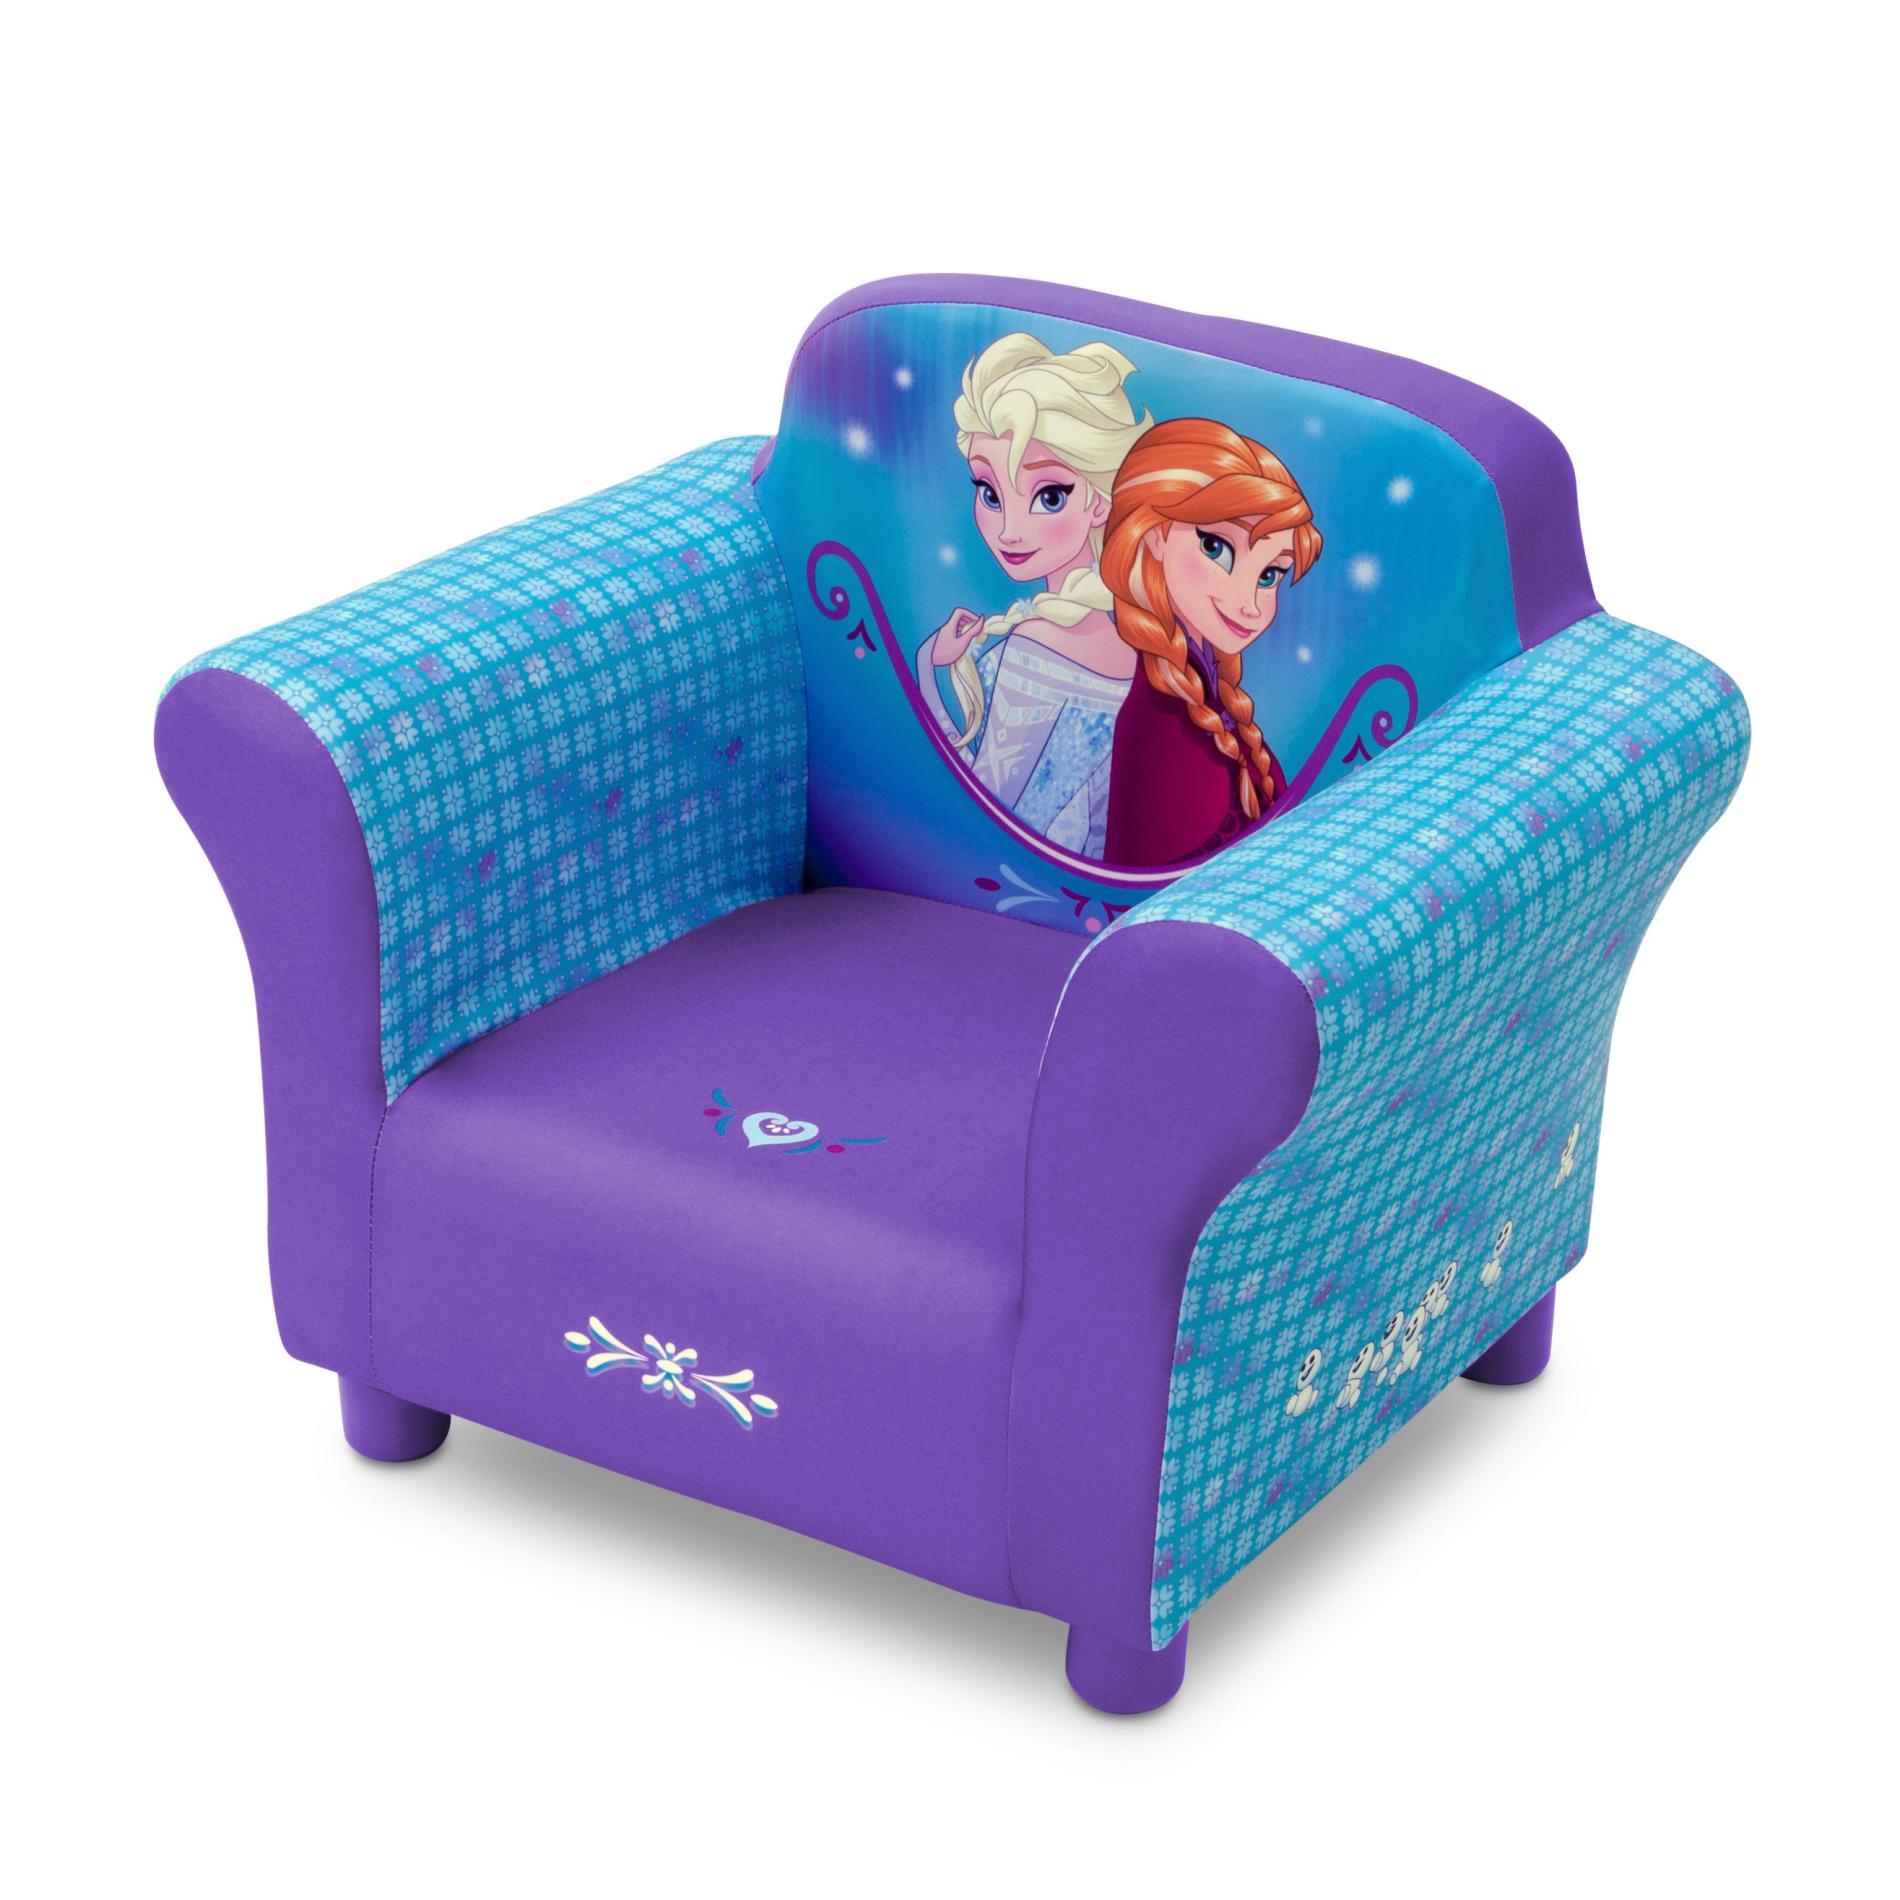 Disney Frozen Toddler Girls Upholstered Chair  Anna